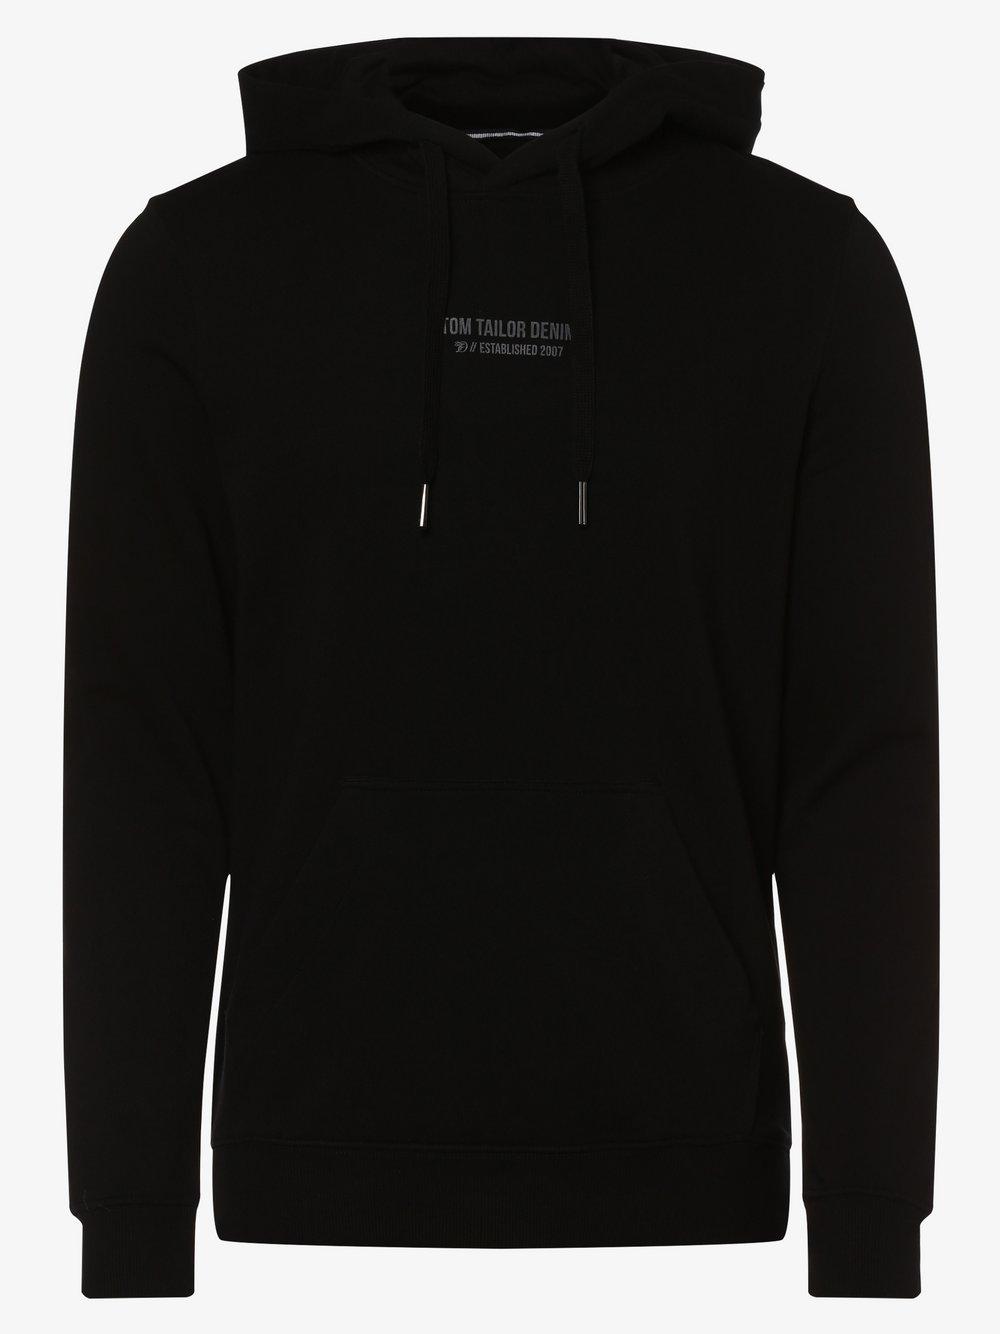 Tom Tailor Denim - Męska bluza nierozpinana, czarny